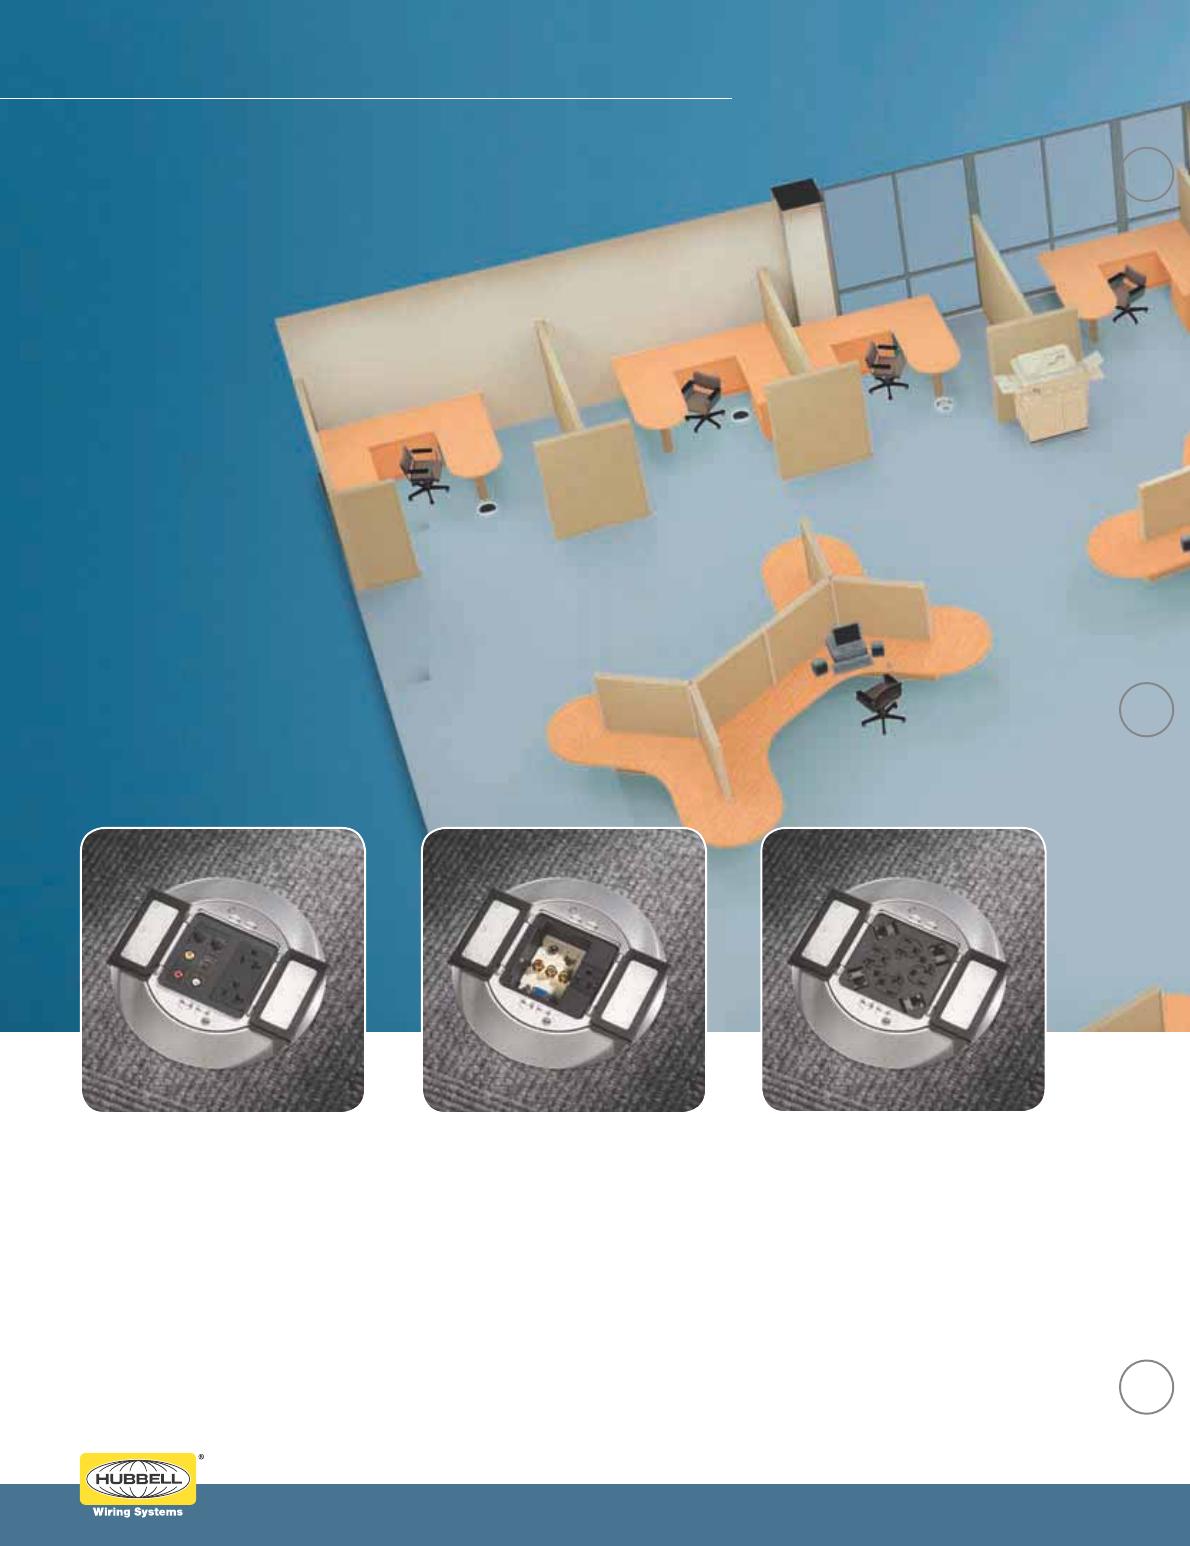 Hubbell PFBCGYA Scrubshield Cover Carpet Flange Gray Plastic for PFB1 Floor Box